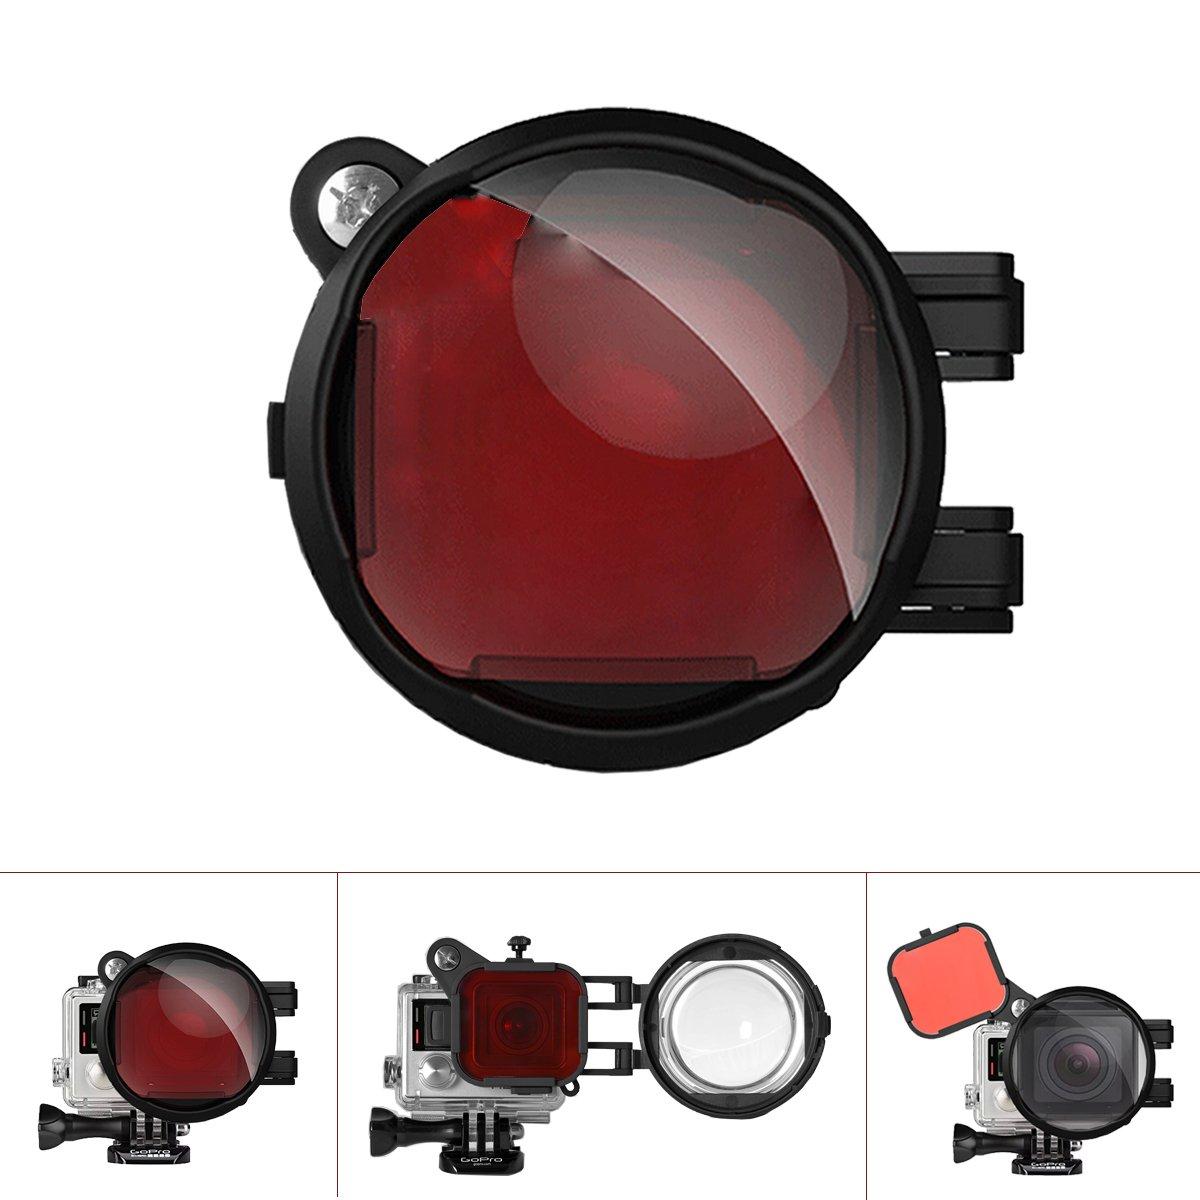 Fantaseal/® Professional 2-in-1 Diving Lens Combo for GoPro Diving Lens Filter GoPro Underwater Lens Filter GoPro Lens GoPro Filter 16X Close Up Macro Lens w//Anti-Loose Safety Lock for GoPro Hero 4 Diving Red Color Correction Filter Hero3 //GoPro H